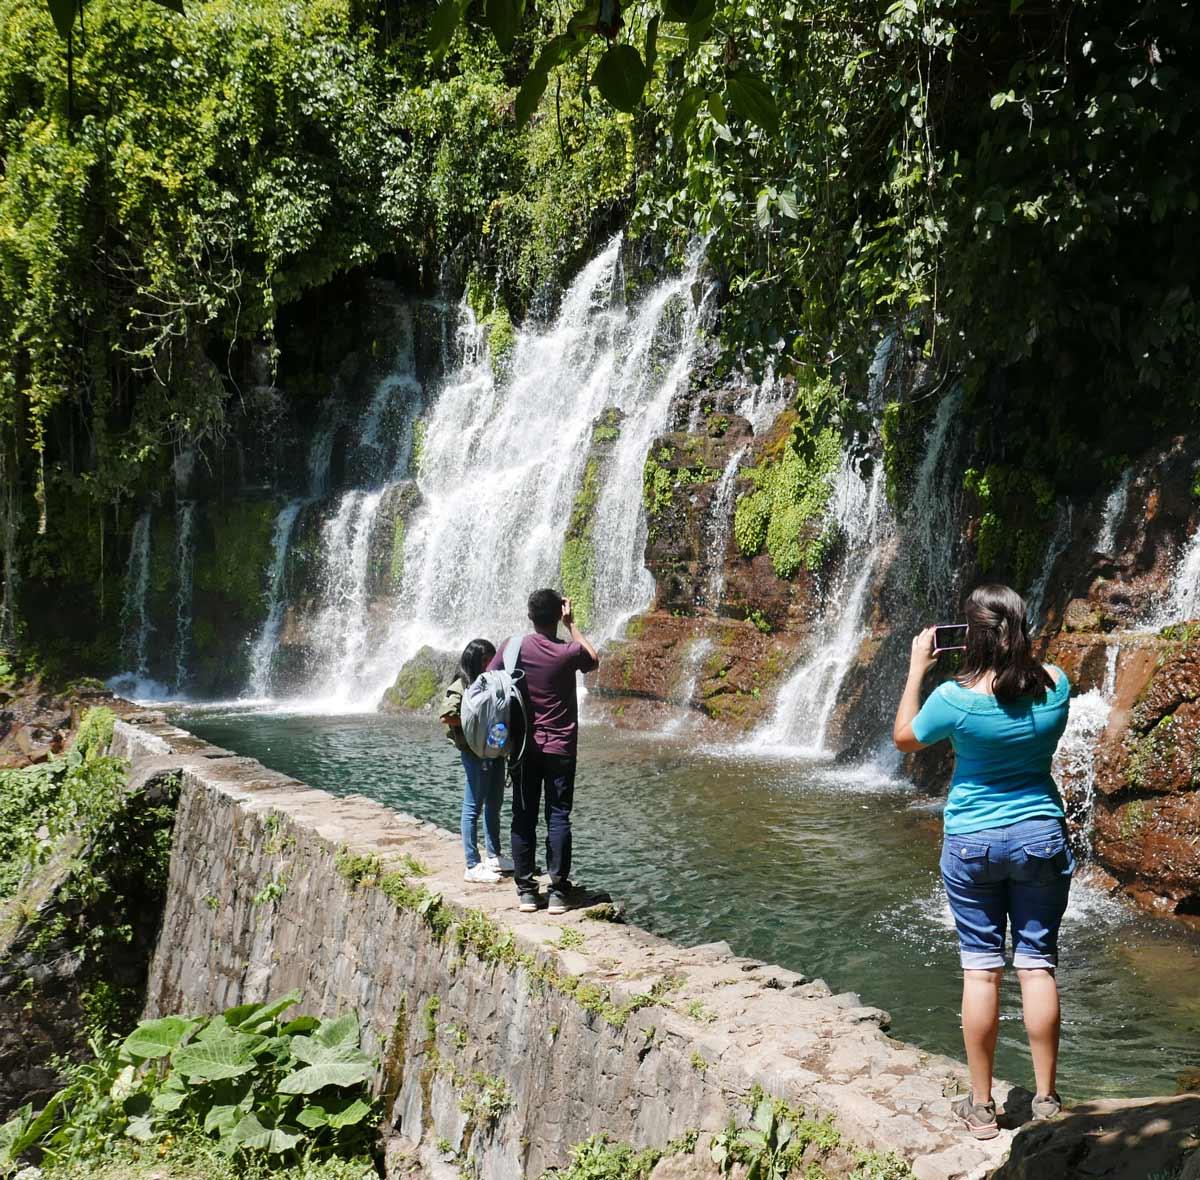 Tourists at one of the Los Chorros waterfalls near Juayua, El Salvador